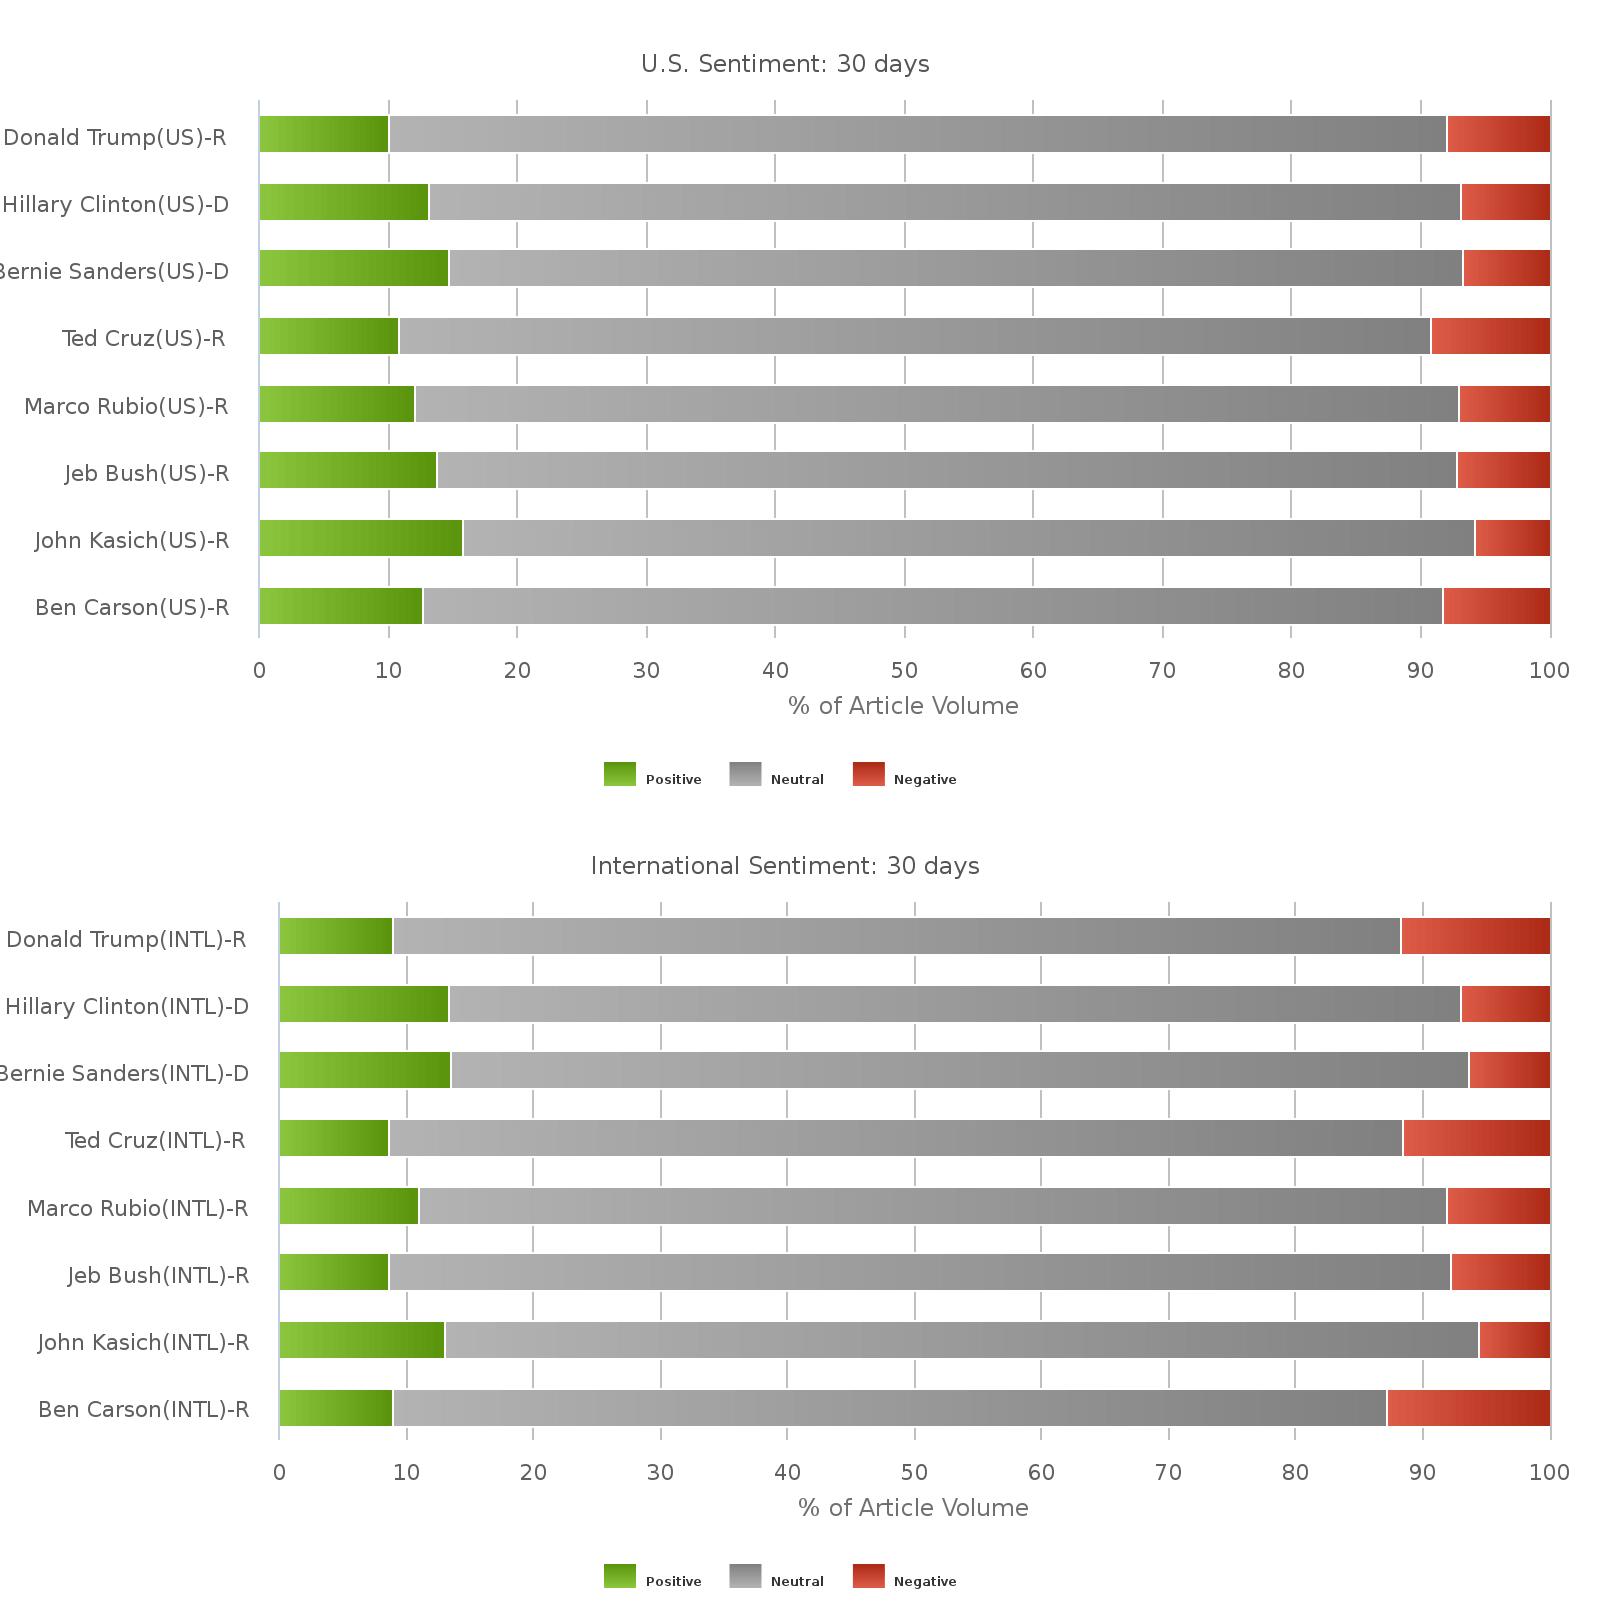 Tonalitätsanalyse der einzelnen Wahlkampfkandidaten